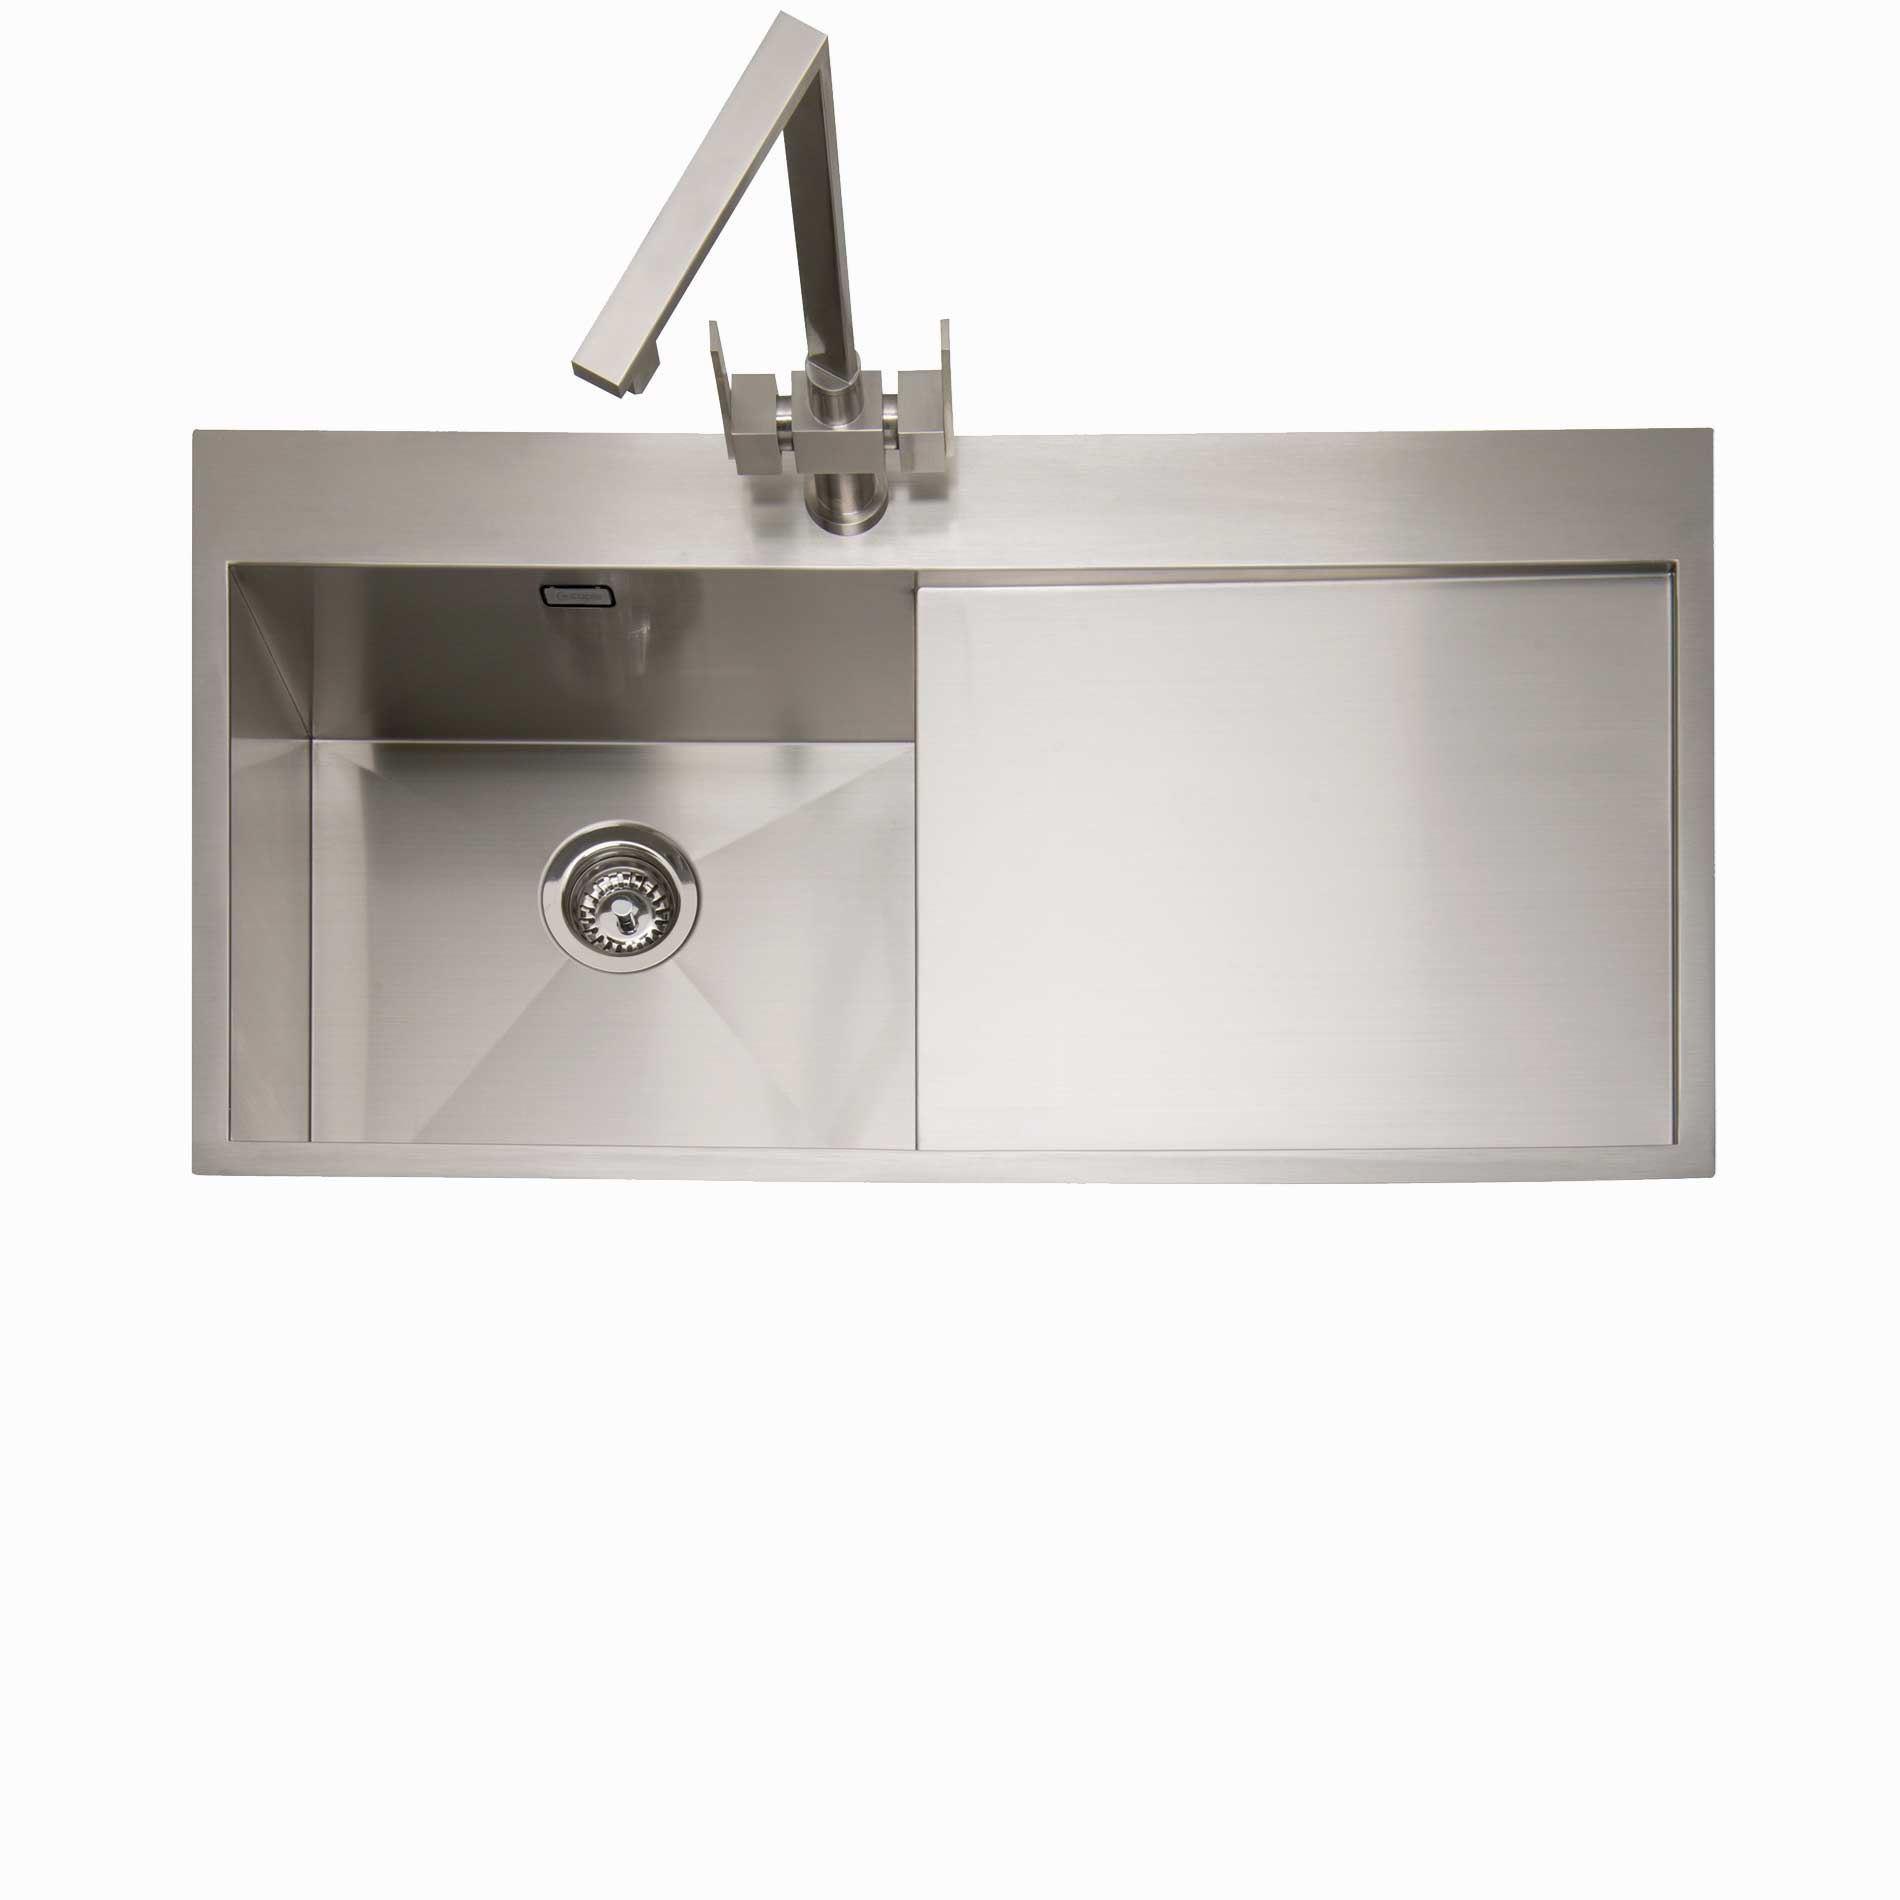 Kitchen Sink Stainless Steel   Caple Cubit 100 Stainless Steel Sink Kitchen Sinks Taps